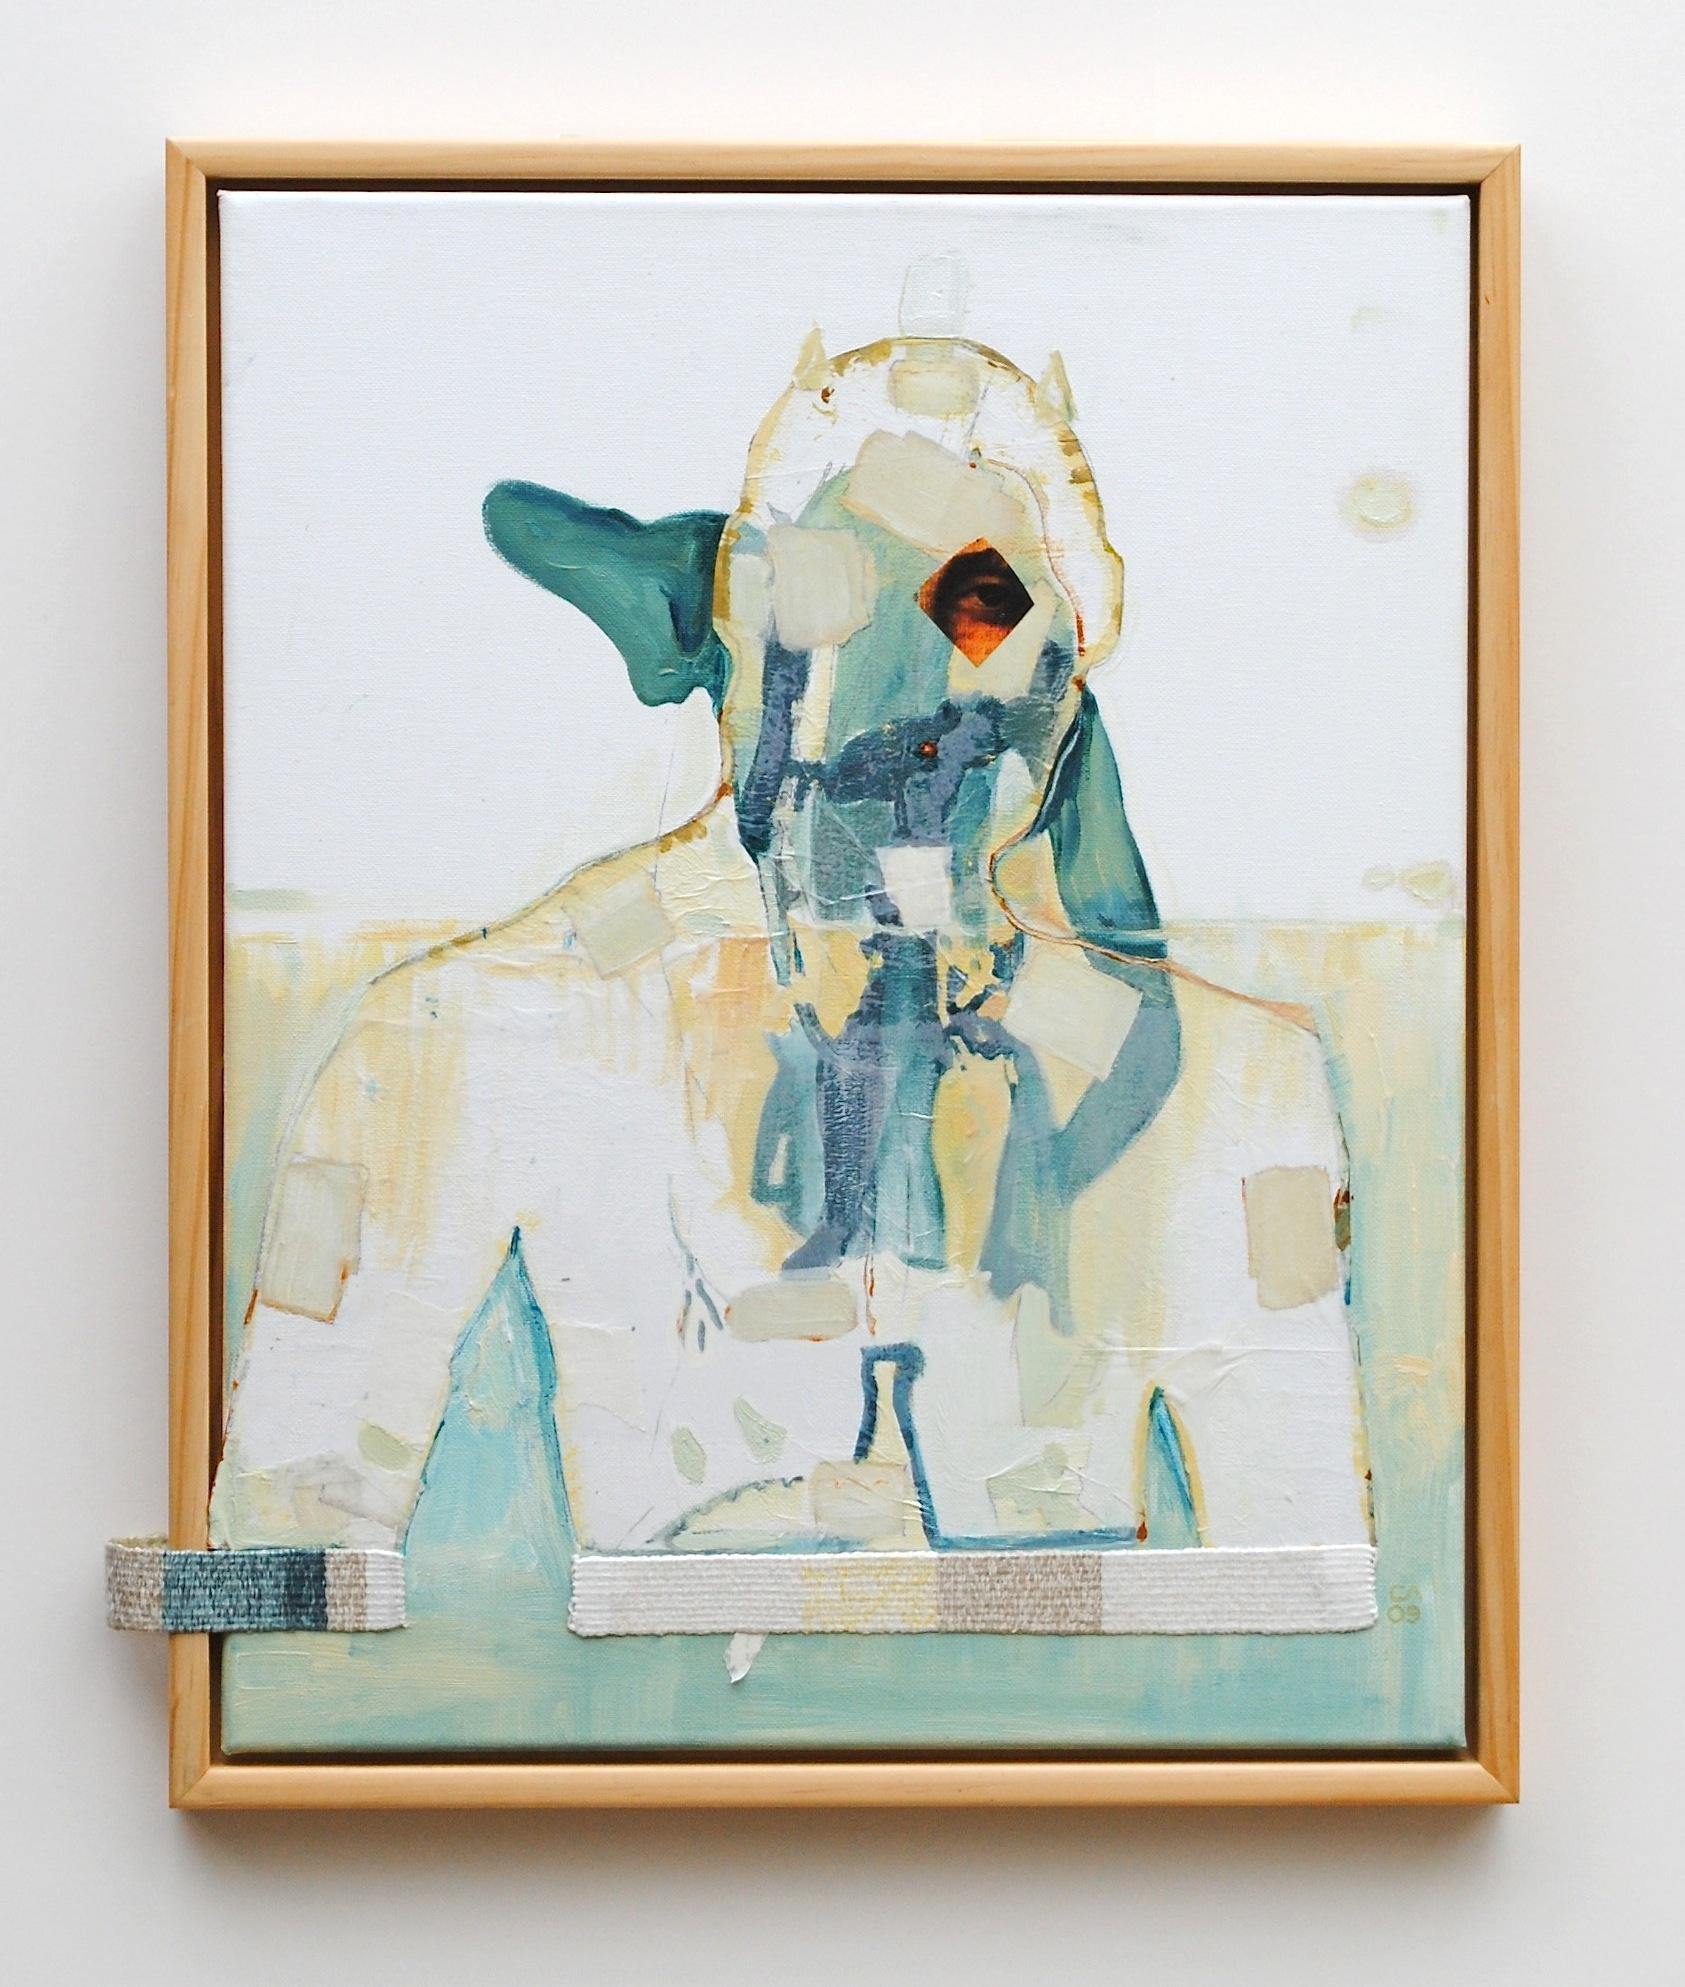 Southport Contemporary Arts: Arts Trail: Cos Ahmet Open Studio